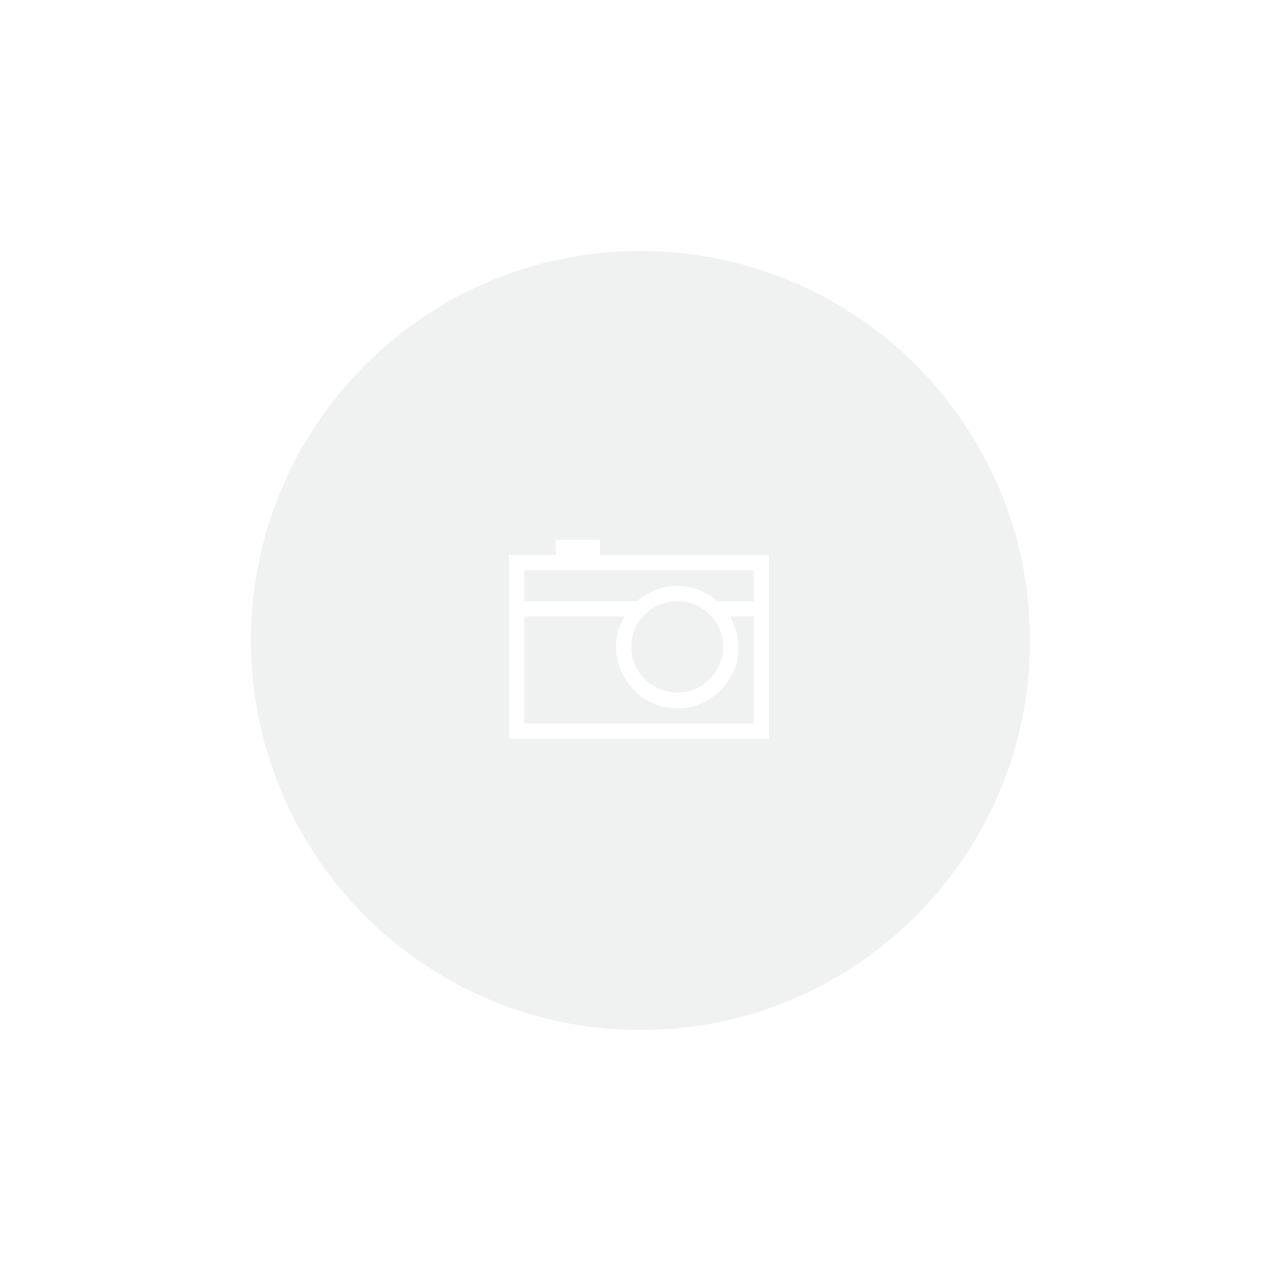 Bomboniere com pes de Cristal Prima Luxo 16,5x20,8cm